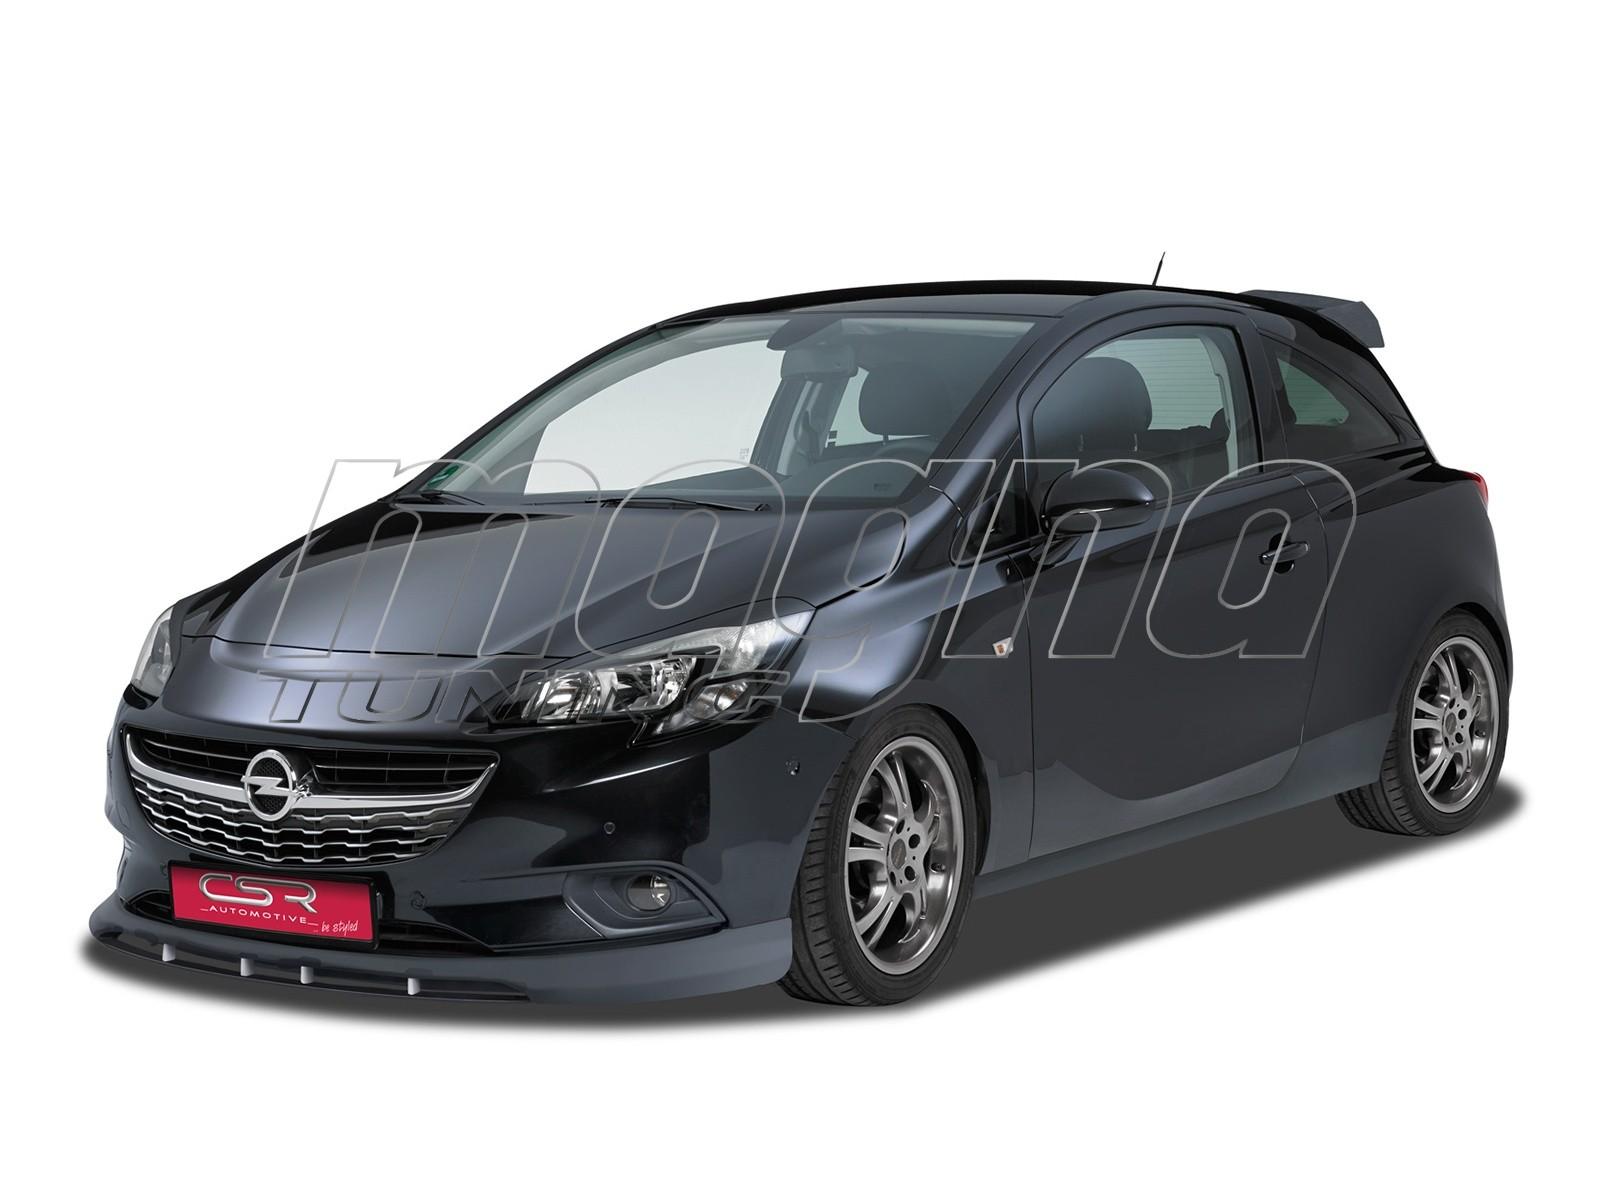 Opel Corsa E Crono Side Skirts